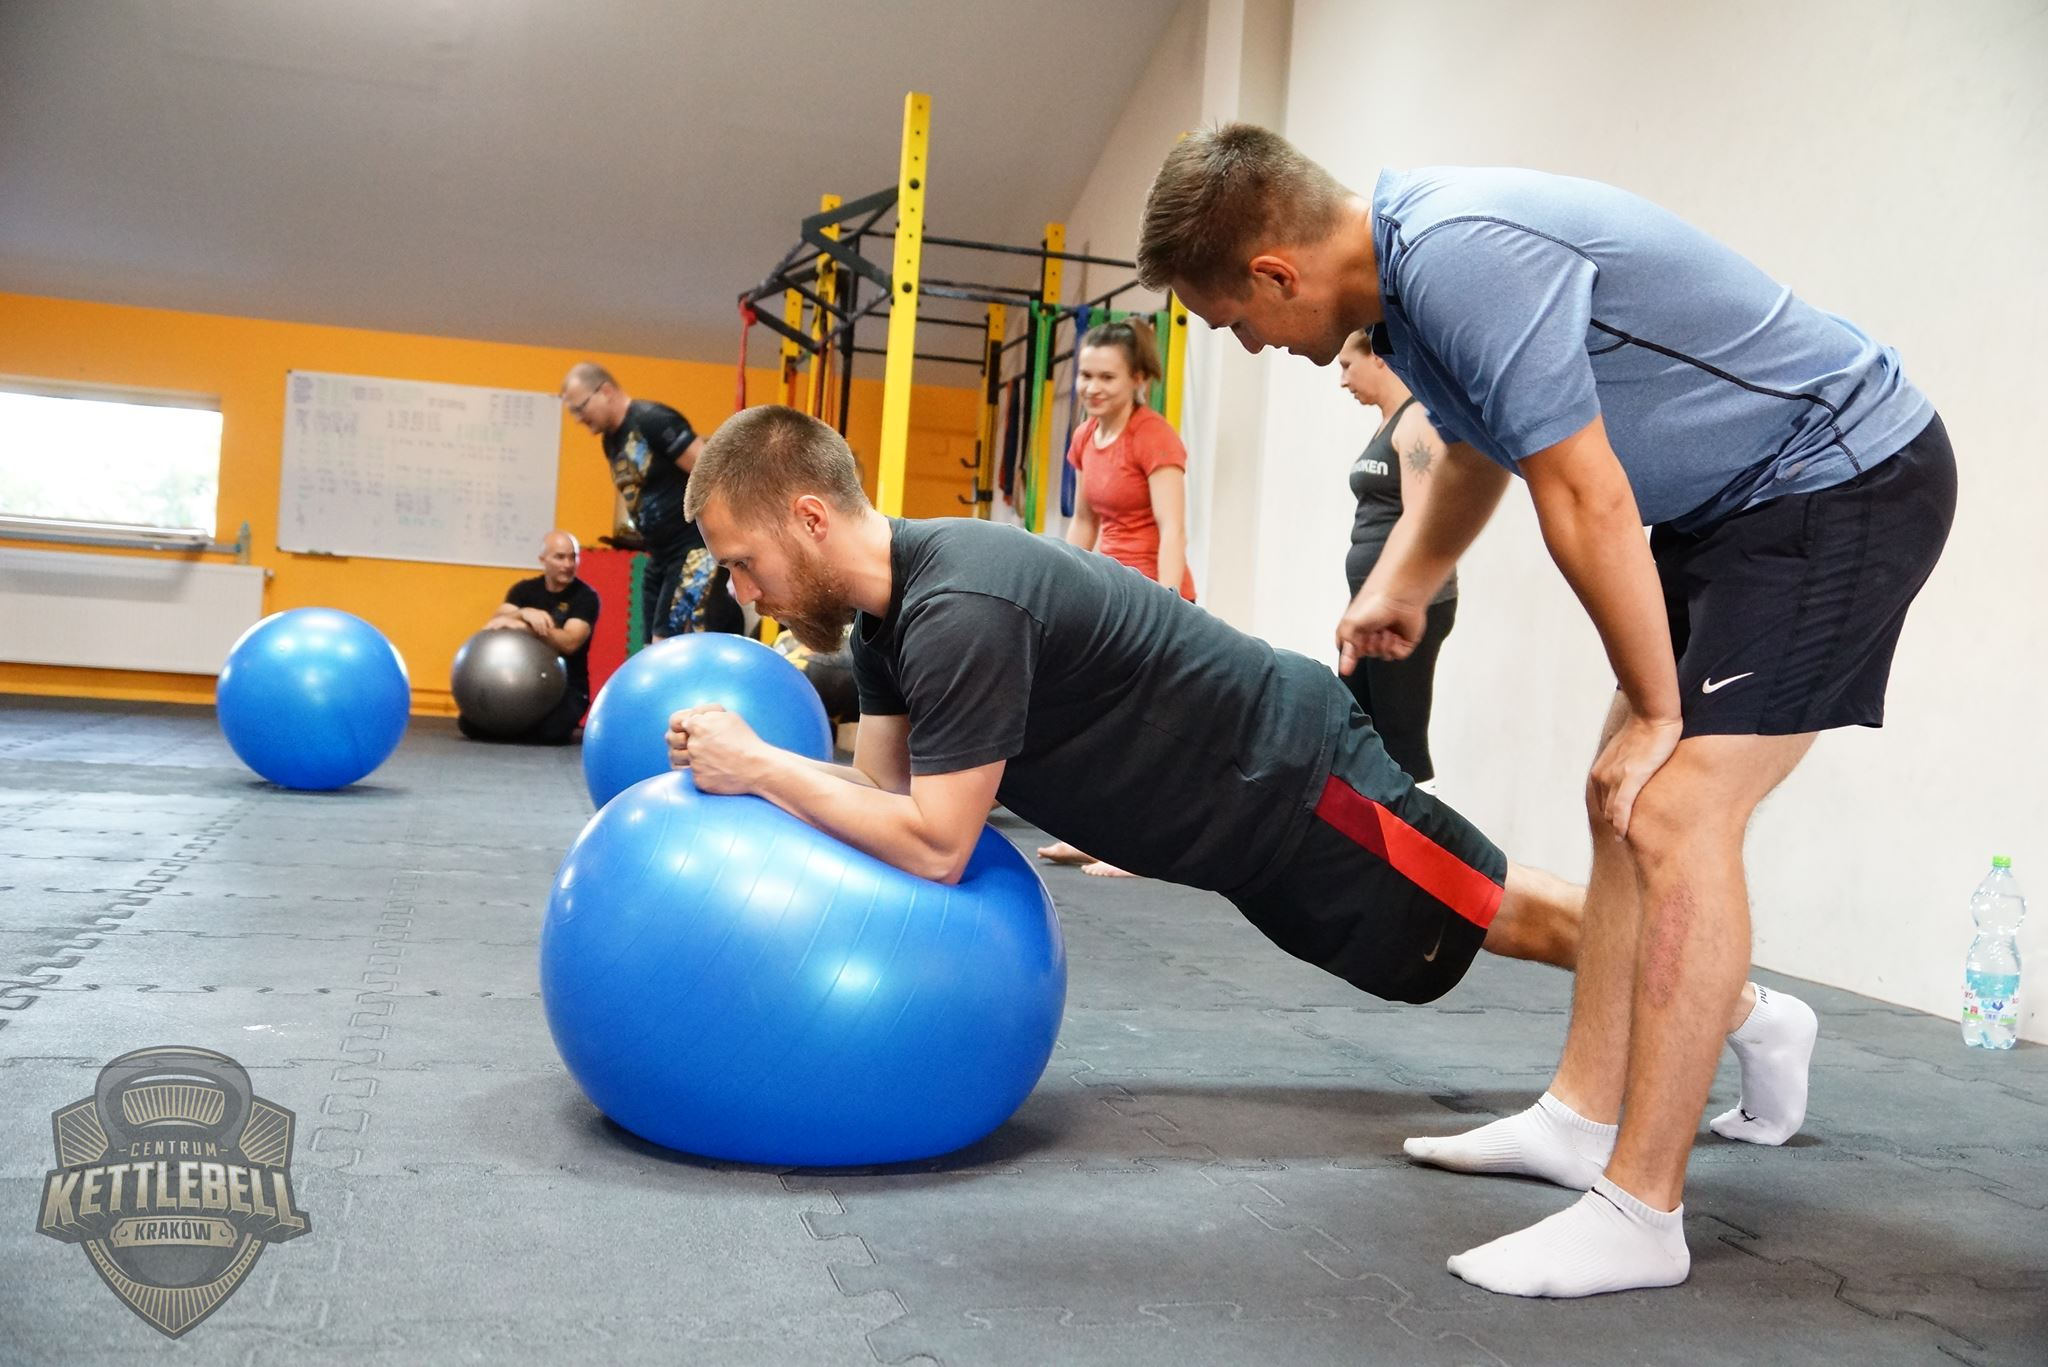 centrum_kettlebell_kraków_trening_plank